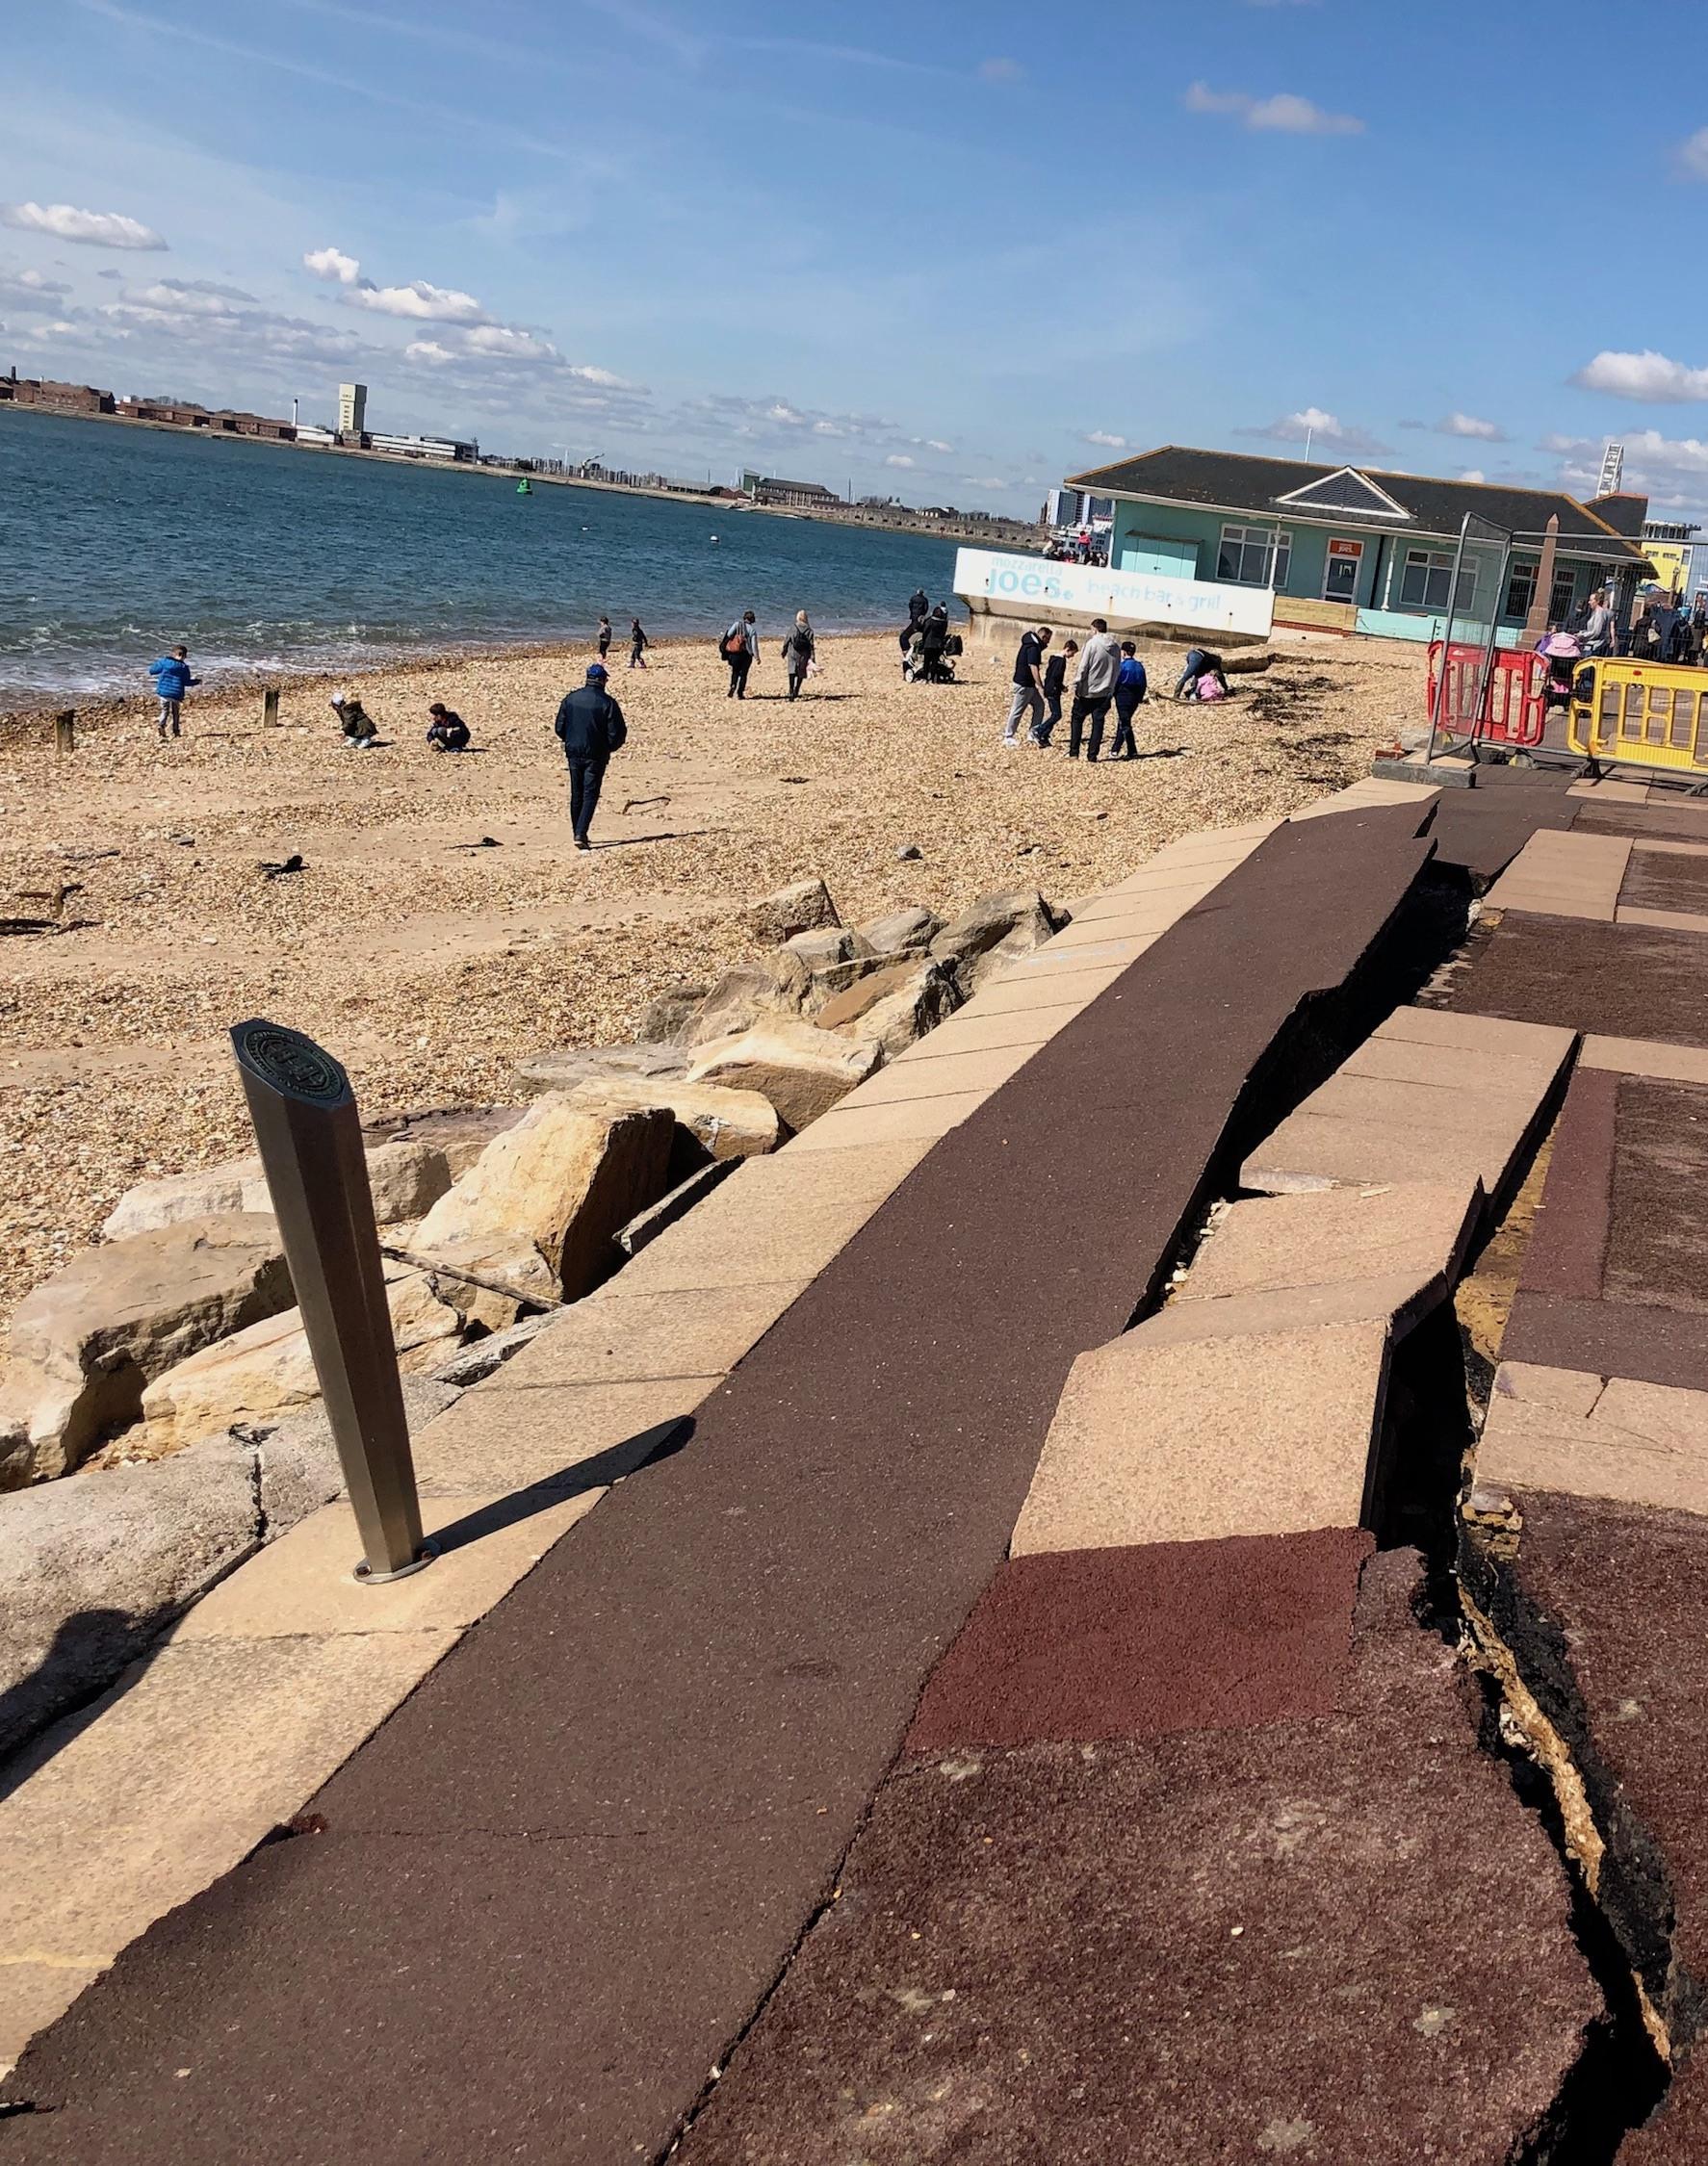 Southsea beach, cracked pavement